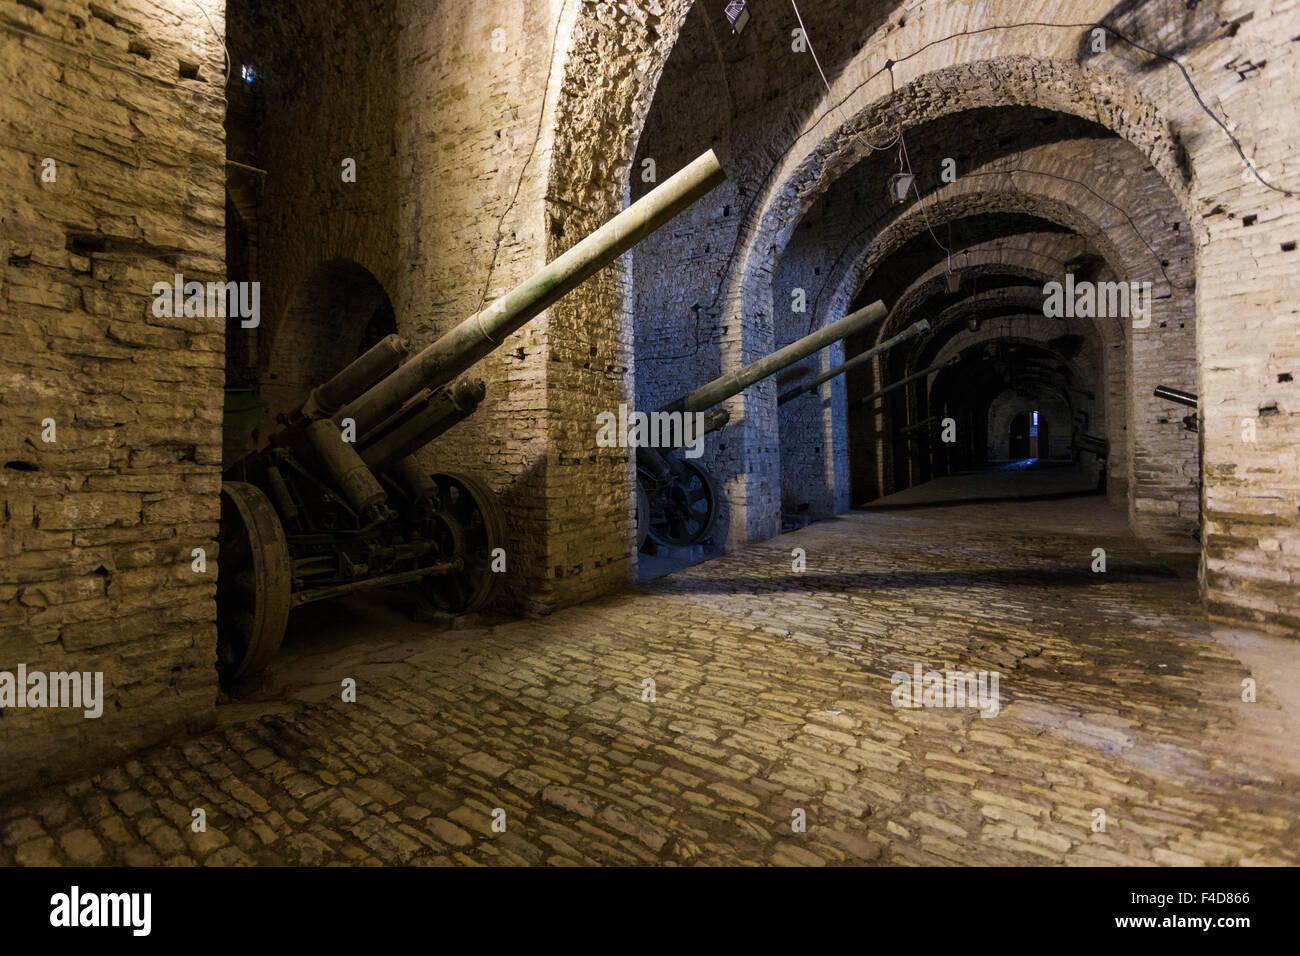 Albania, Gjirokastra, castle, National Museum of Armaments, artillery - Stock Image